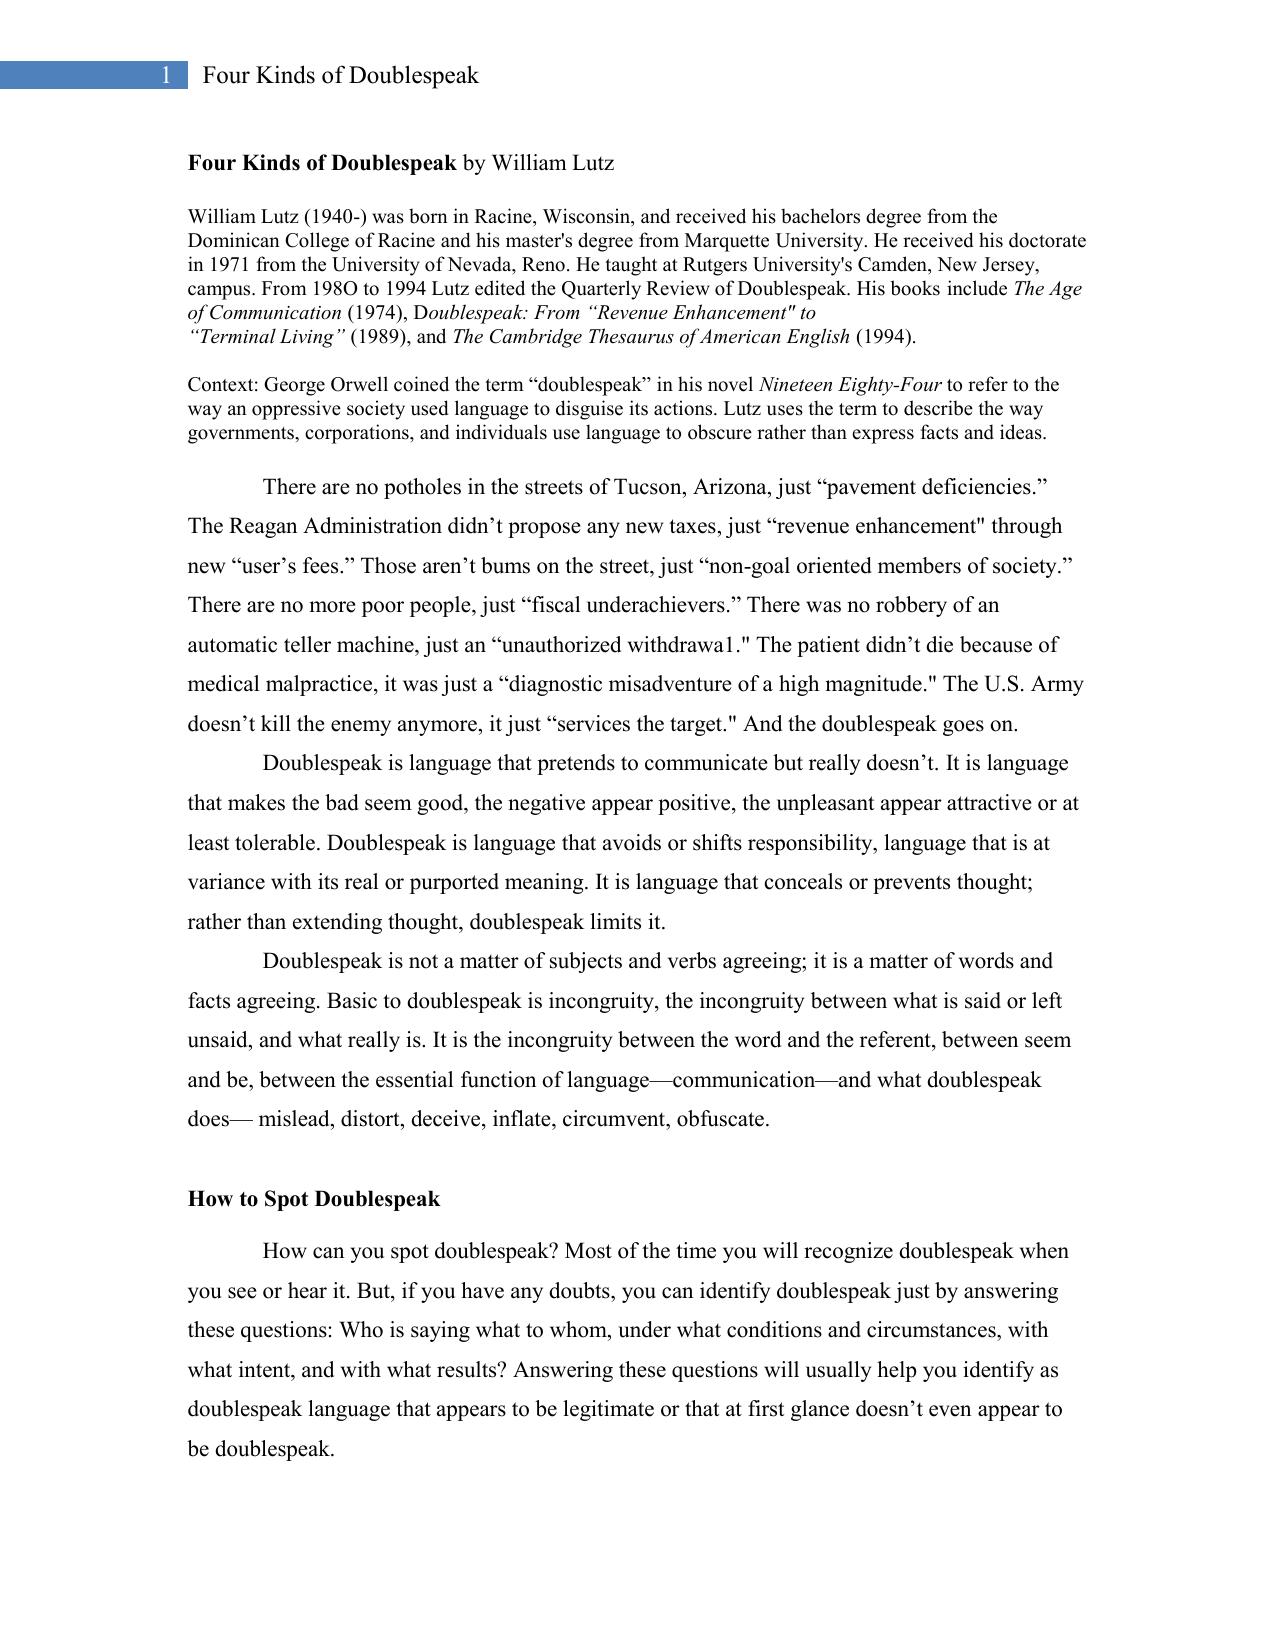 Worksheets Euphemism And Doublespeak Worksheet Answers 008963862 1 0305dc675012b9029029705805d2afa7 png